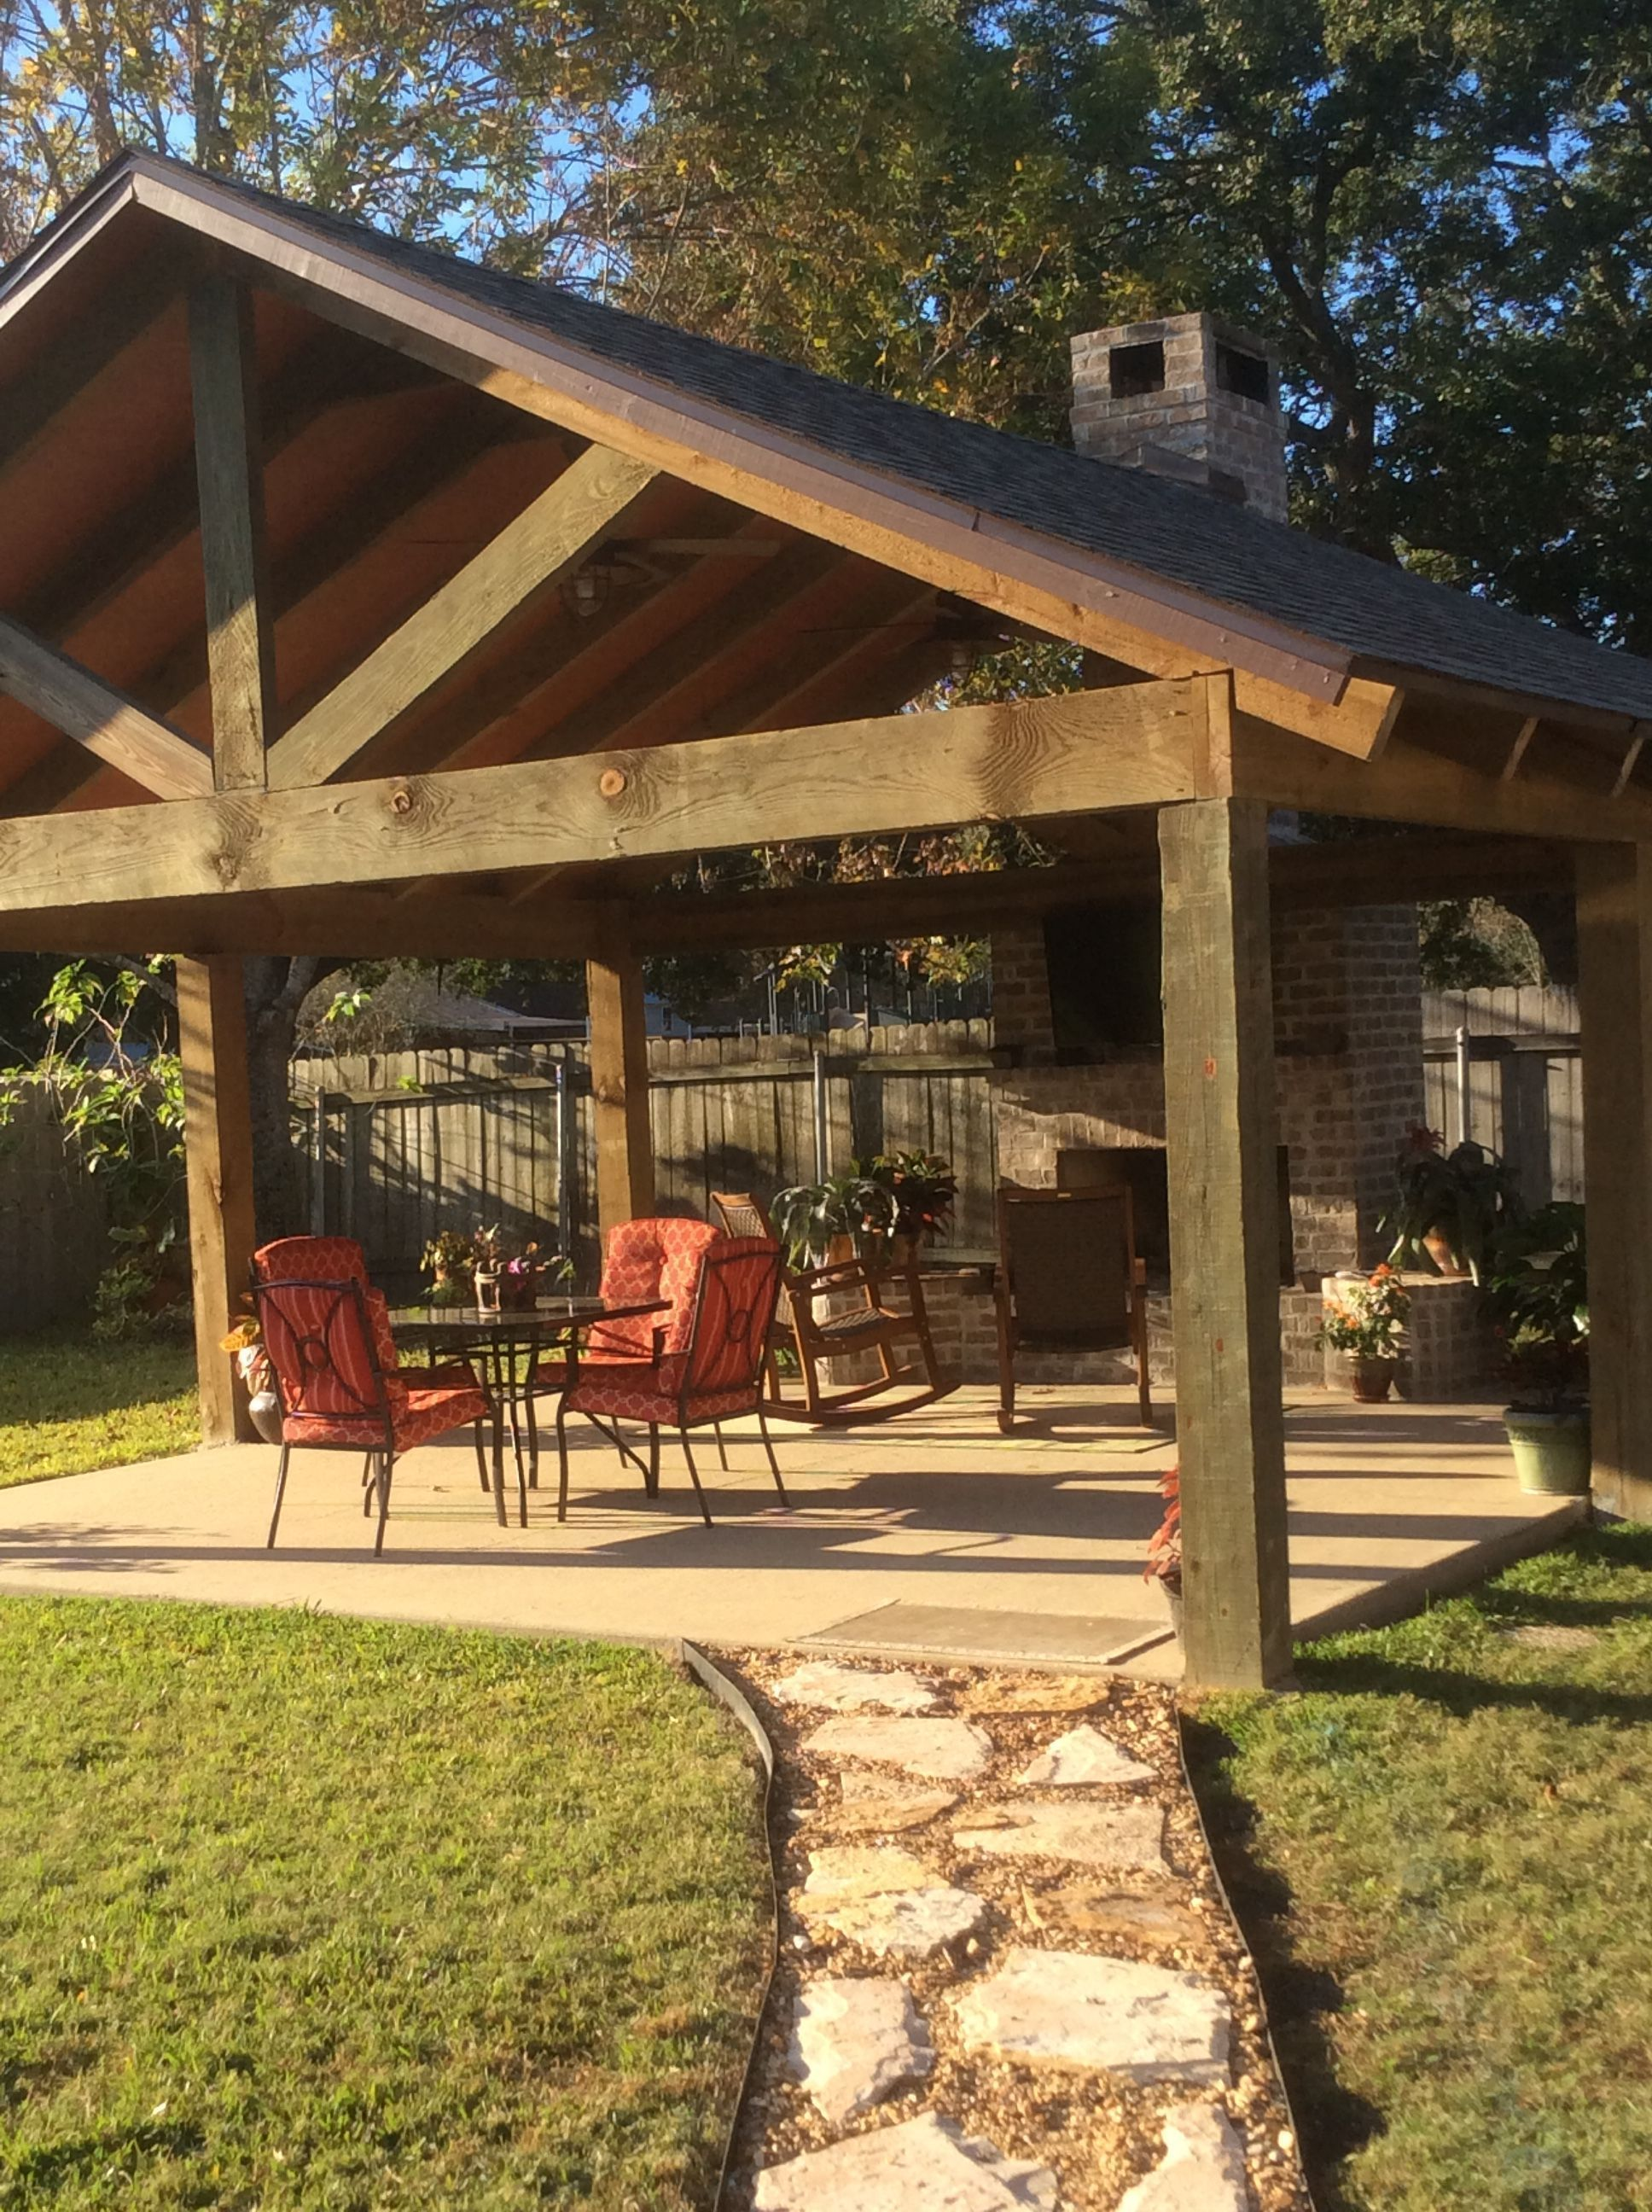 13 Some Of The Coolest Ways How To Makeover Pavilion Ideas Backyard Outdoor Remodel Backyard Pavilion Backyard Gazebo